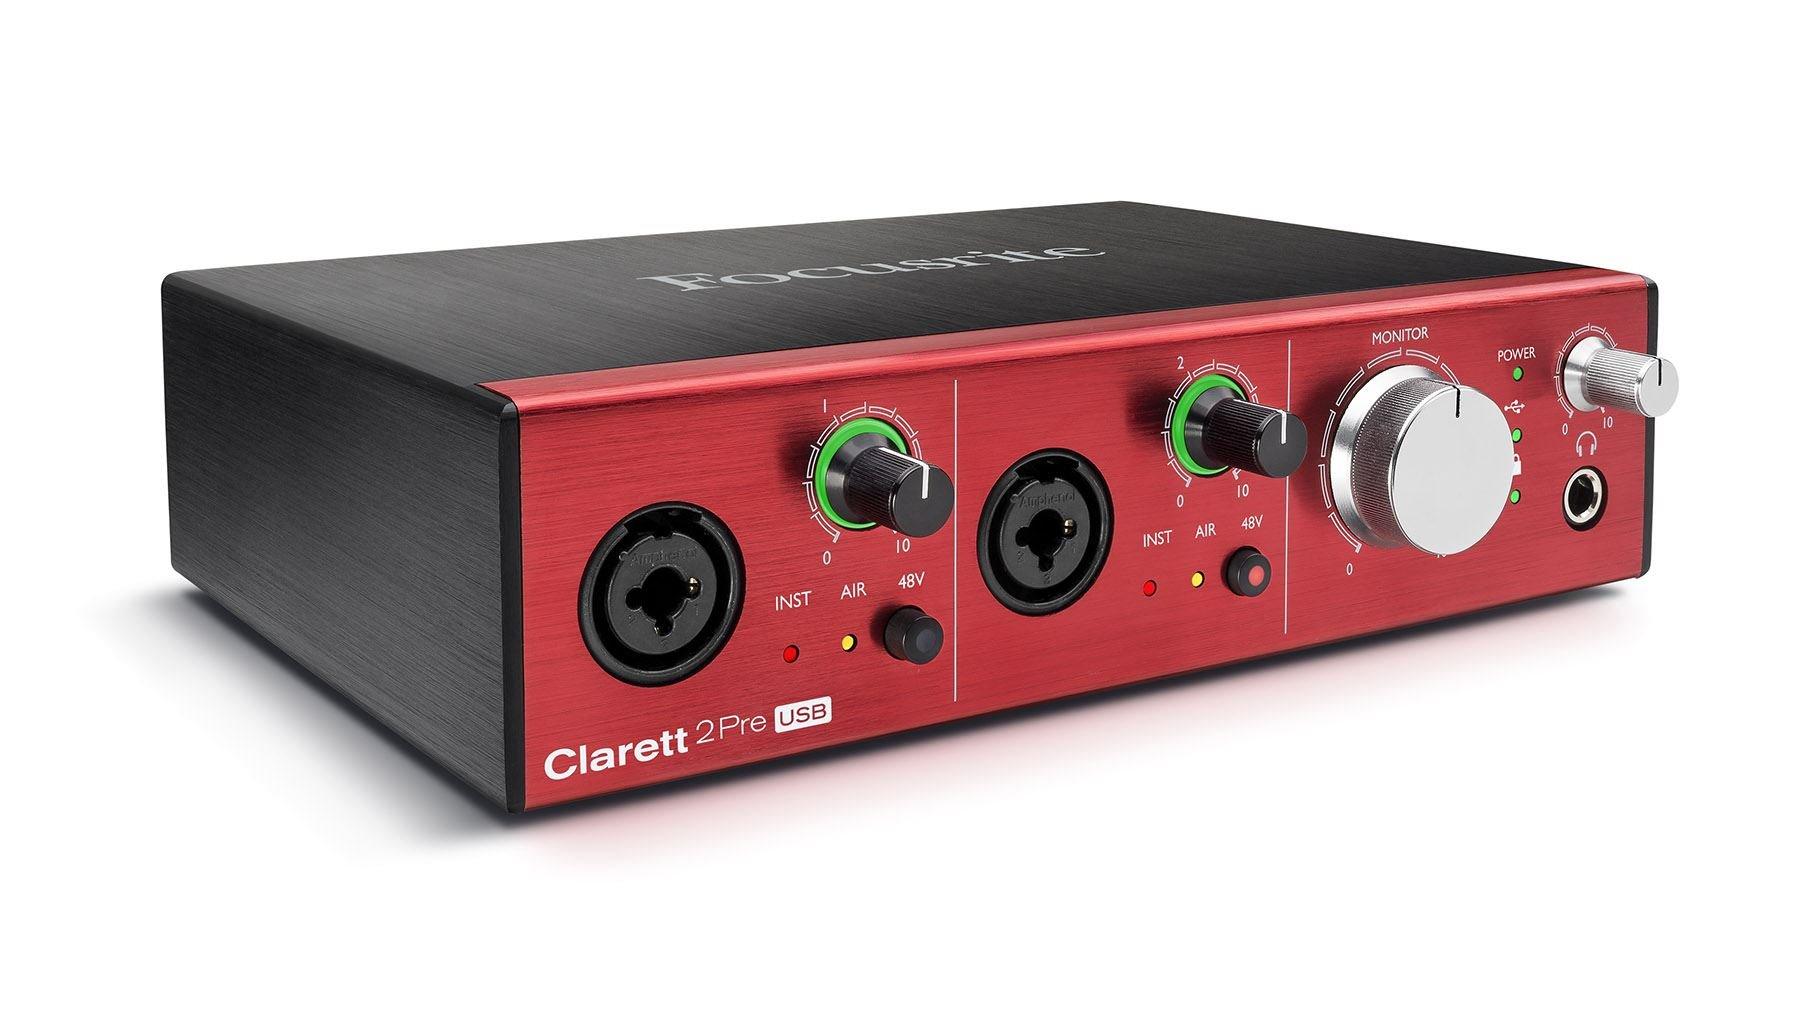 Focusrite Clarett 2Pre USB 10-In/4-Out Audio Interface by Focusrite